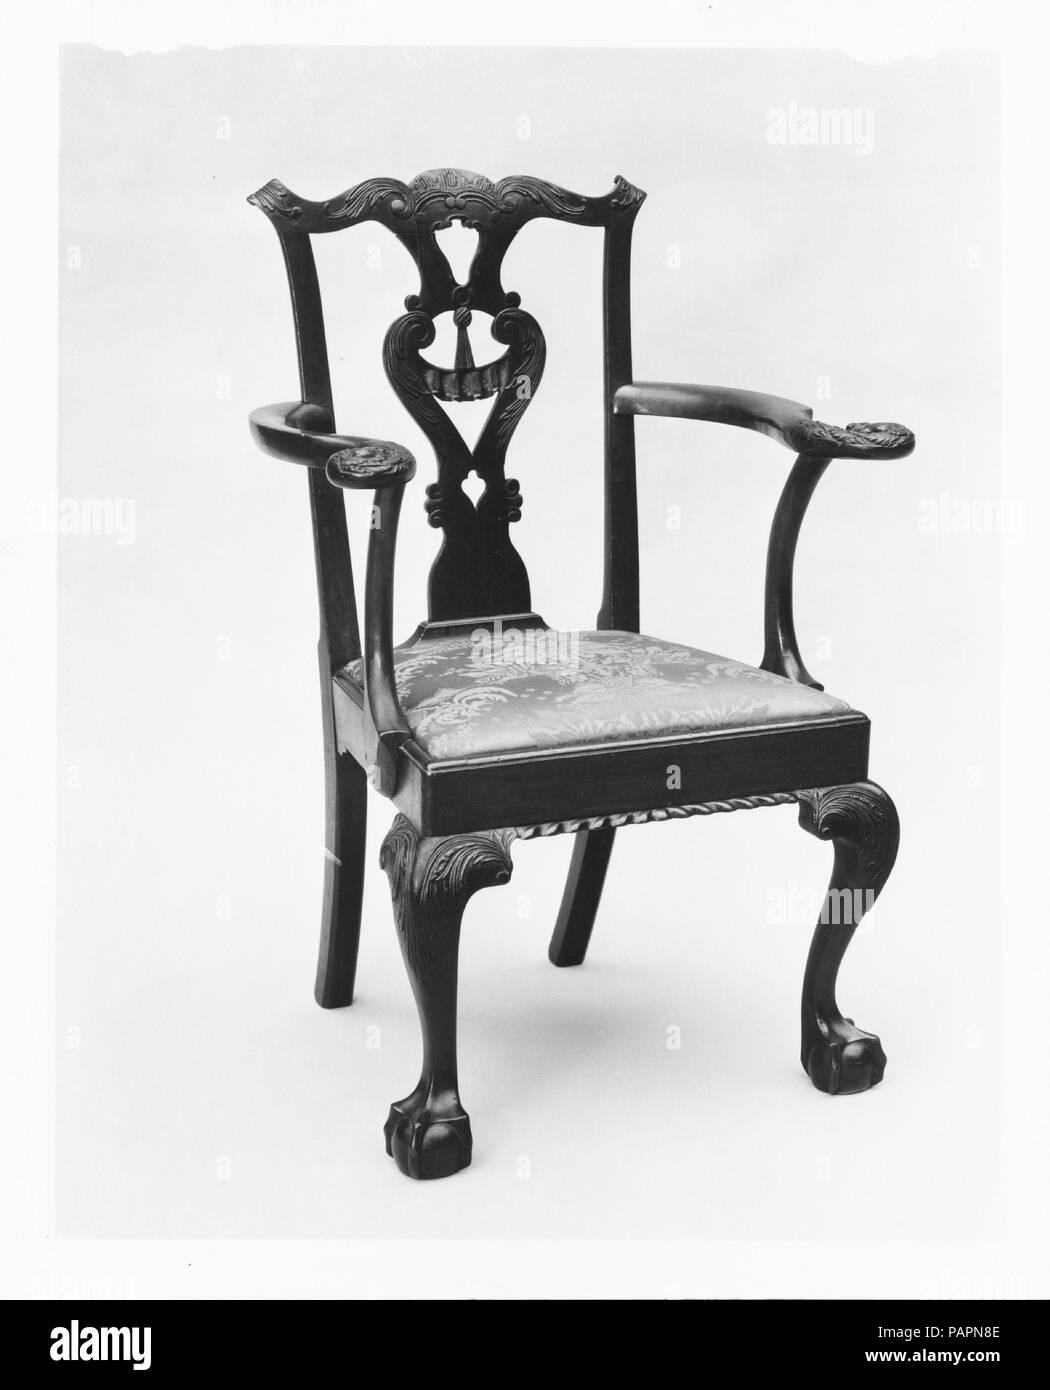 Armchair. Culture: American. Dimensions: 39 1/8 x 20 7/8 x 22 in. (99.4 x 53 x 55.9 cm). Date: 1755-75. Museum: Metropolitan Museum of Art, New York, USA. Stock Photo